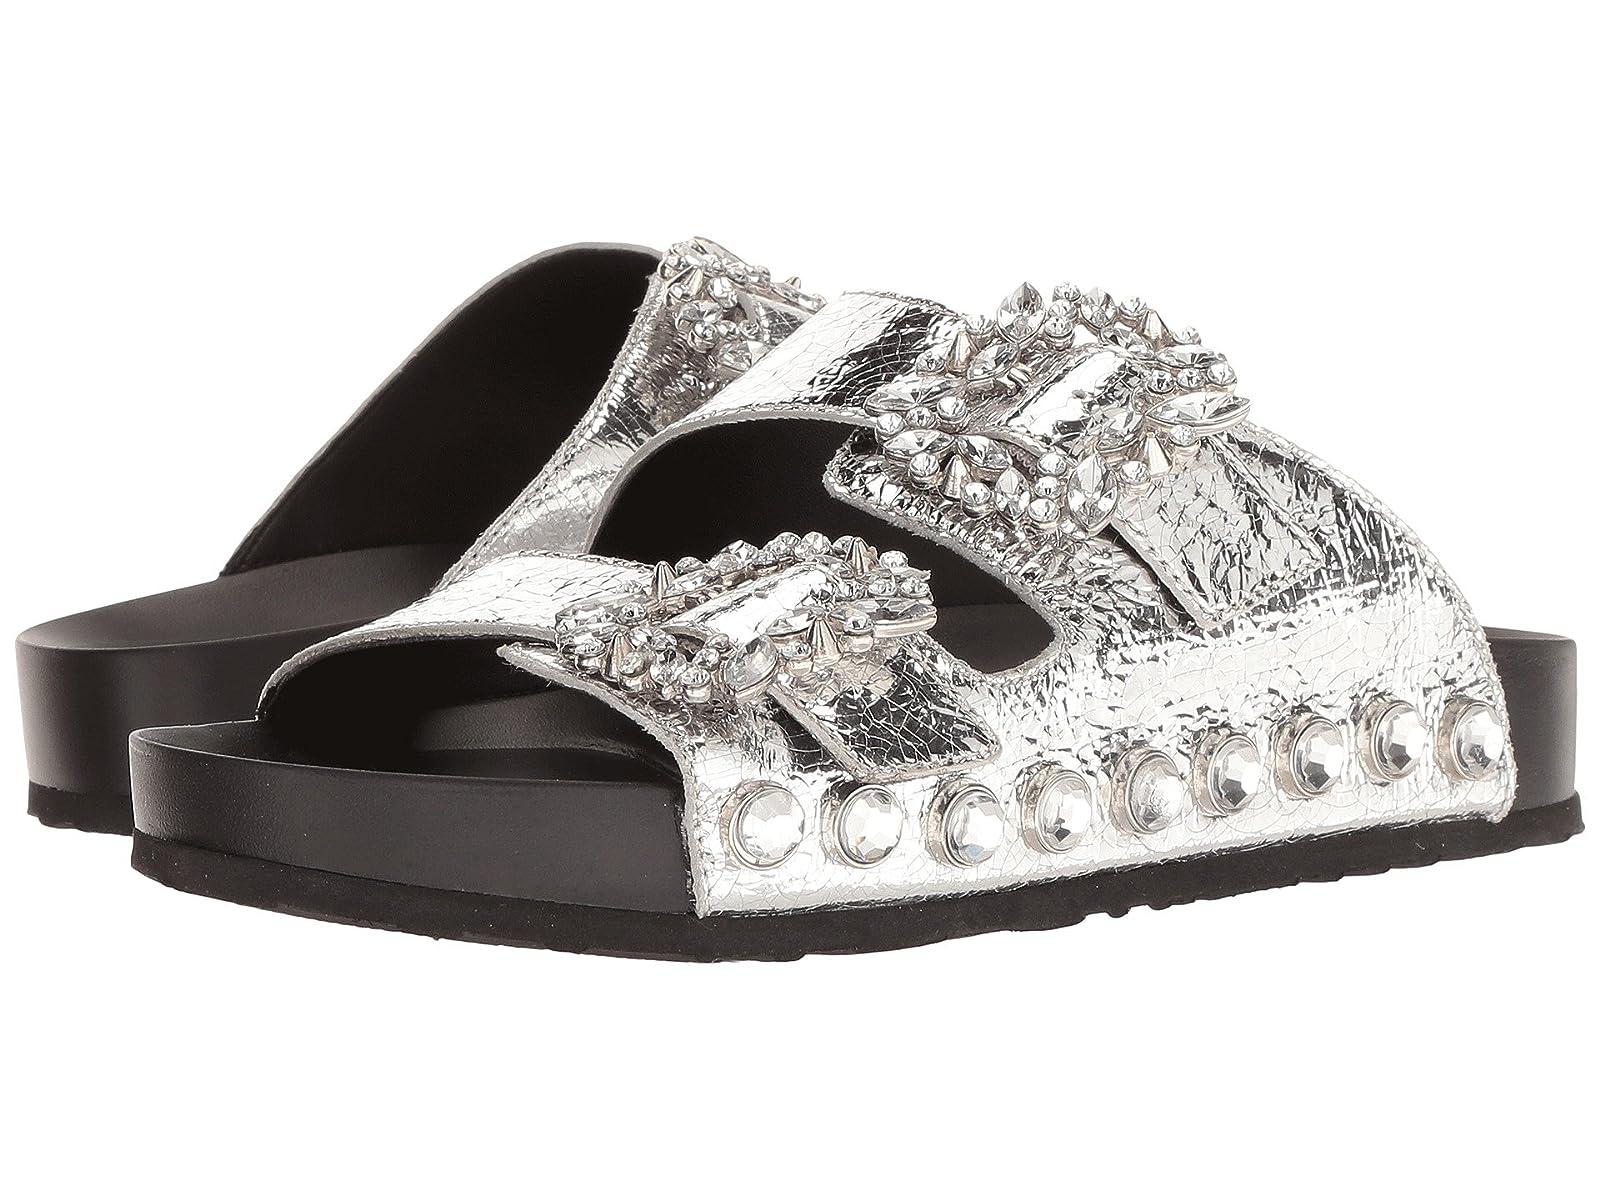 Jessica Simpson GemeliaAtmospheric grades have affordable shoes